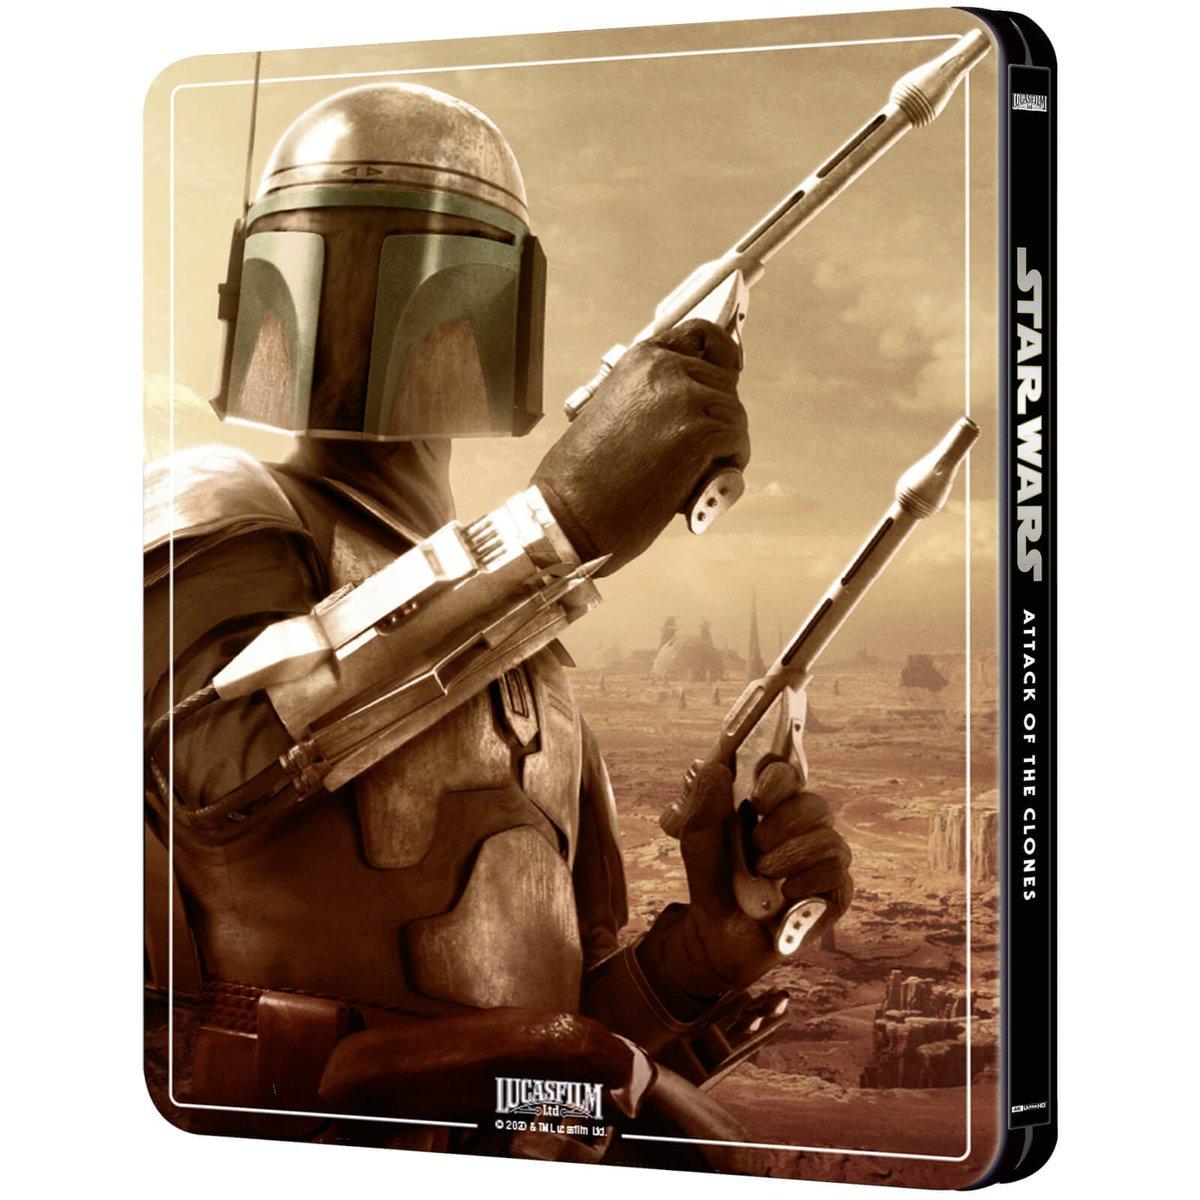 Ultra Hd Blu Ray On Twitter Star Wars Episode Iii Revenge Of The Sith 4k Ultra Hd Blu Ray Steelbook Edition 3 Discs Including Uhd Bd Https T Co U0qqddveux Https T Co Eg3qnlspyu